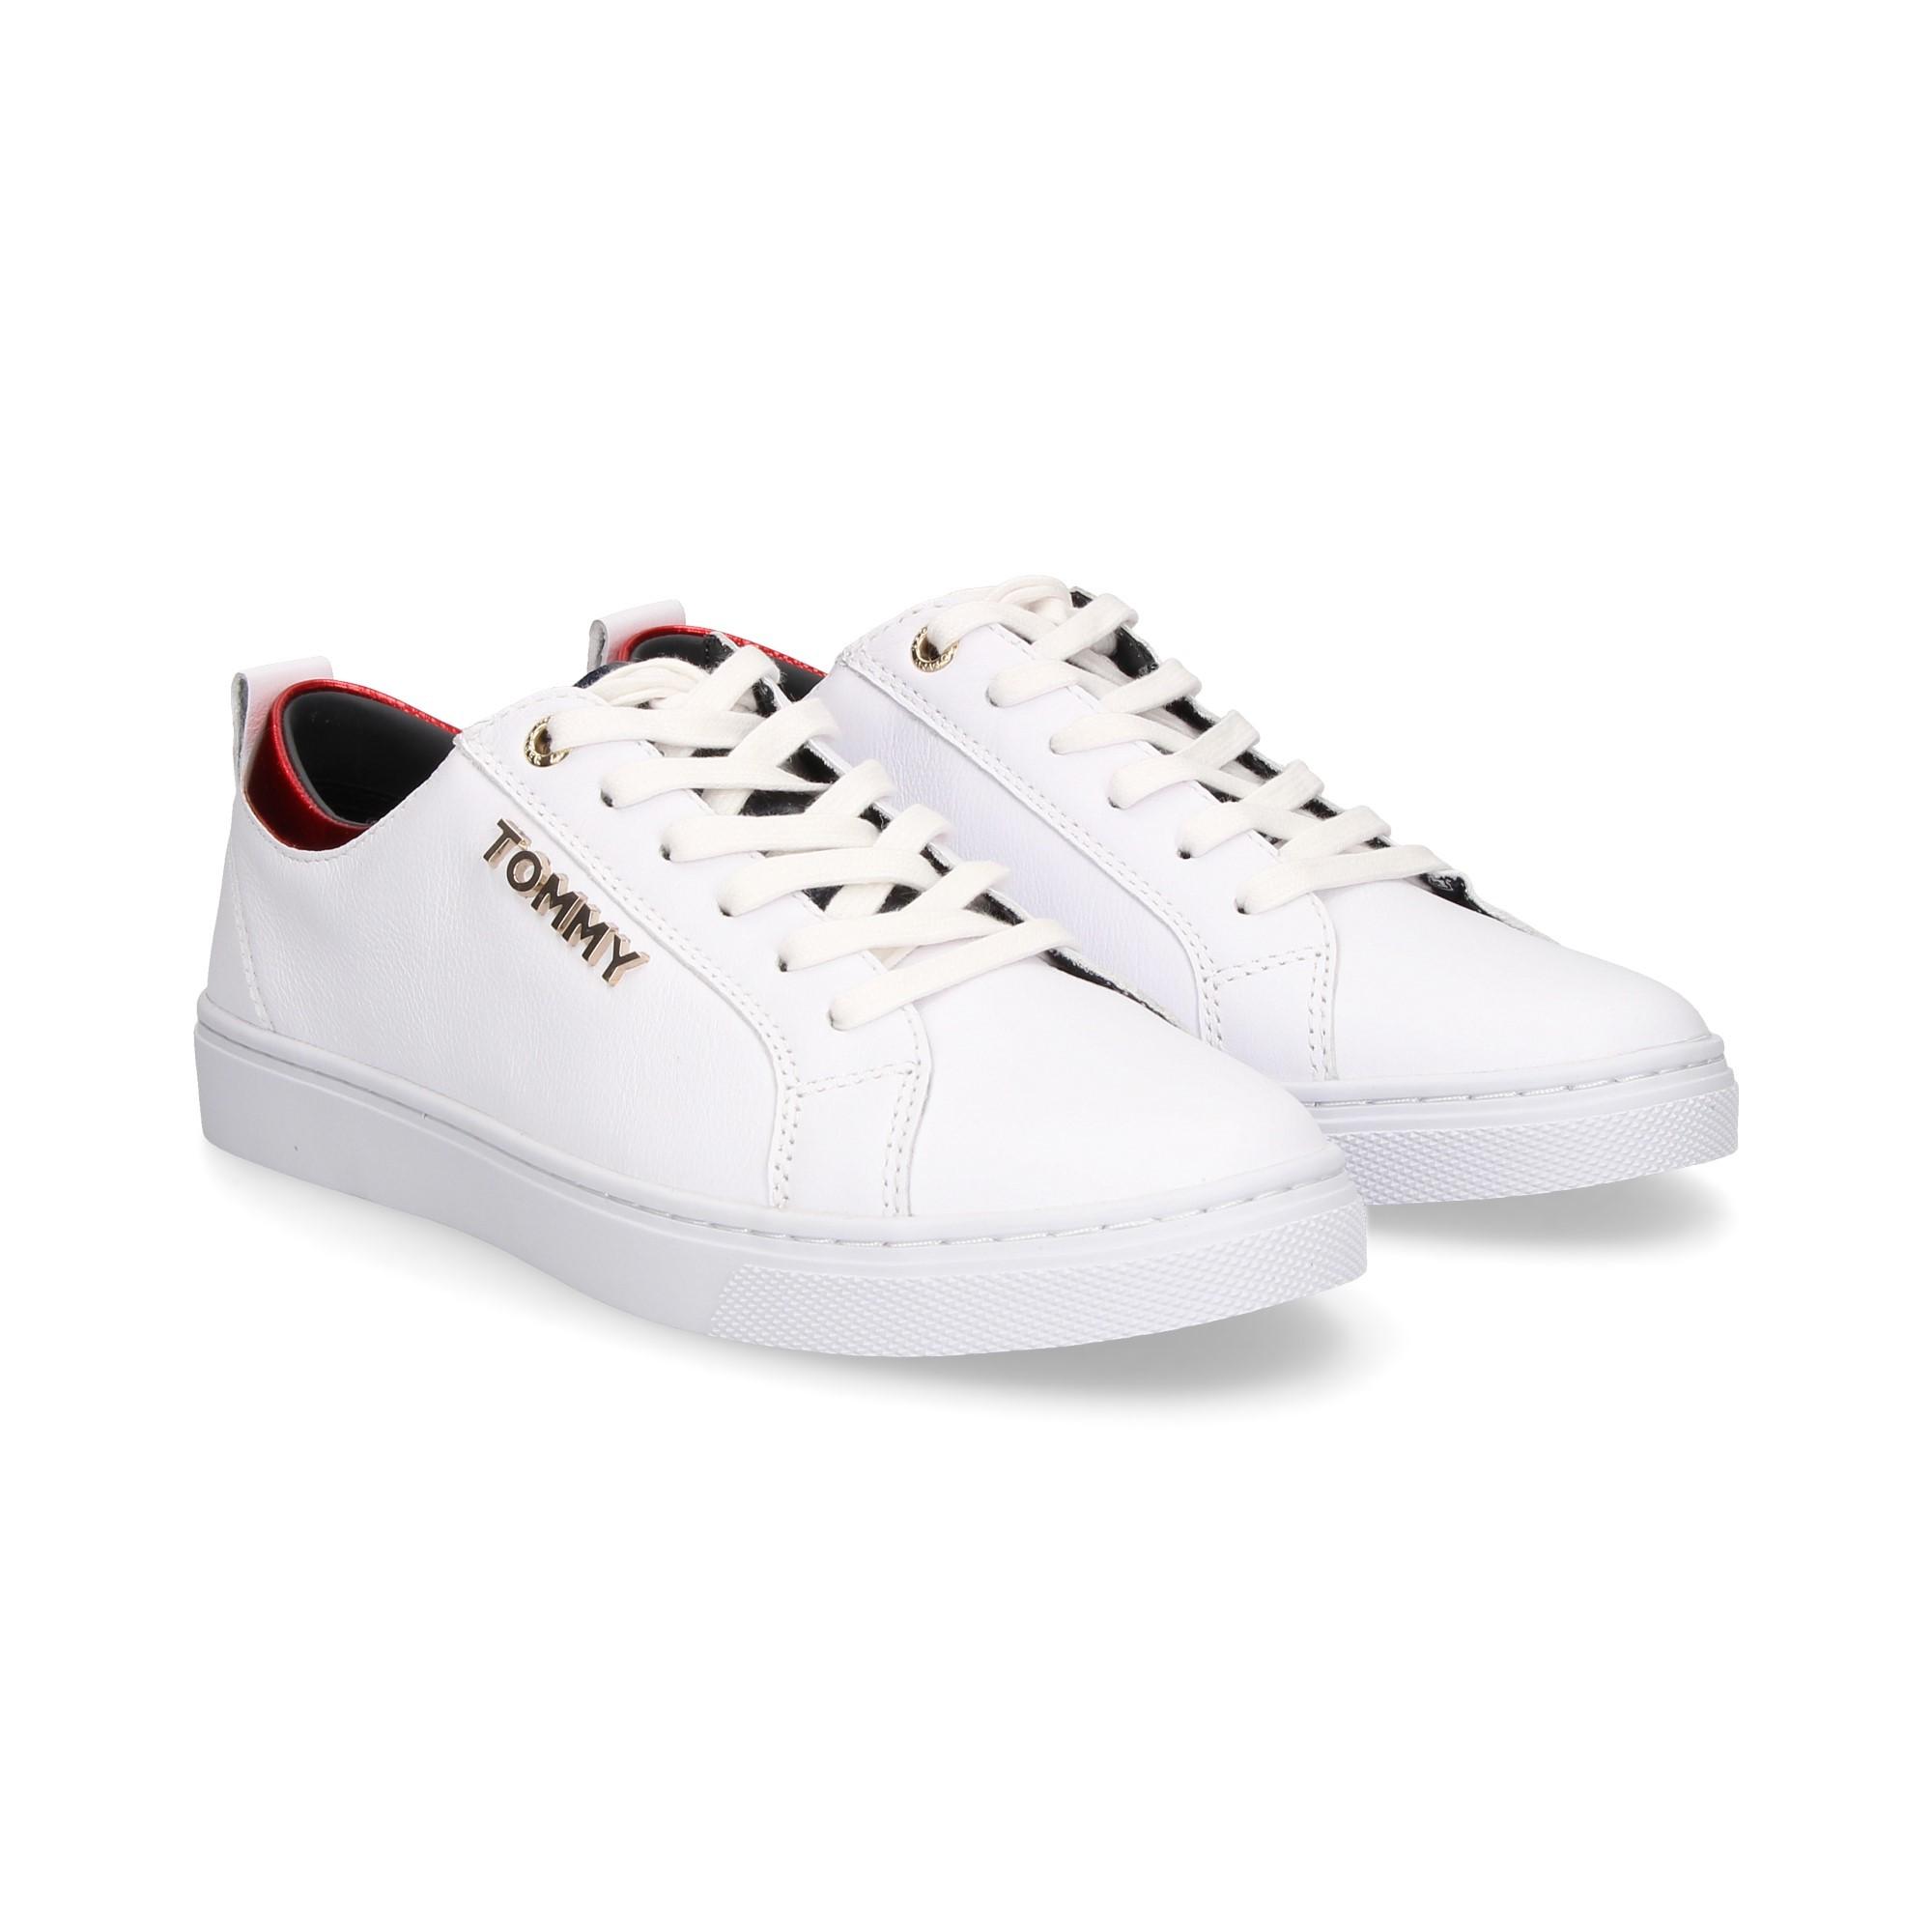 5625cc0e52fd TOMMY HILFIGER Women s Sneakers FW03776 100 WHITE